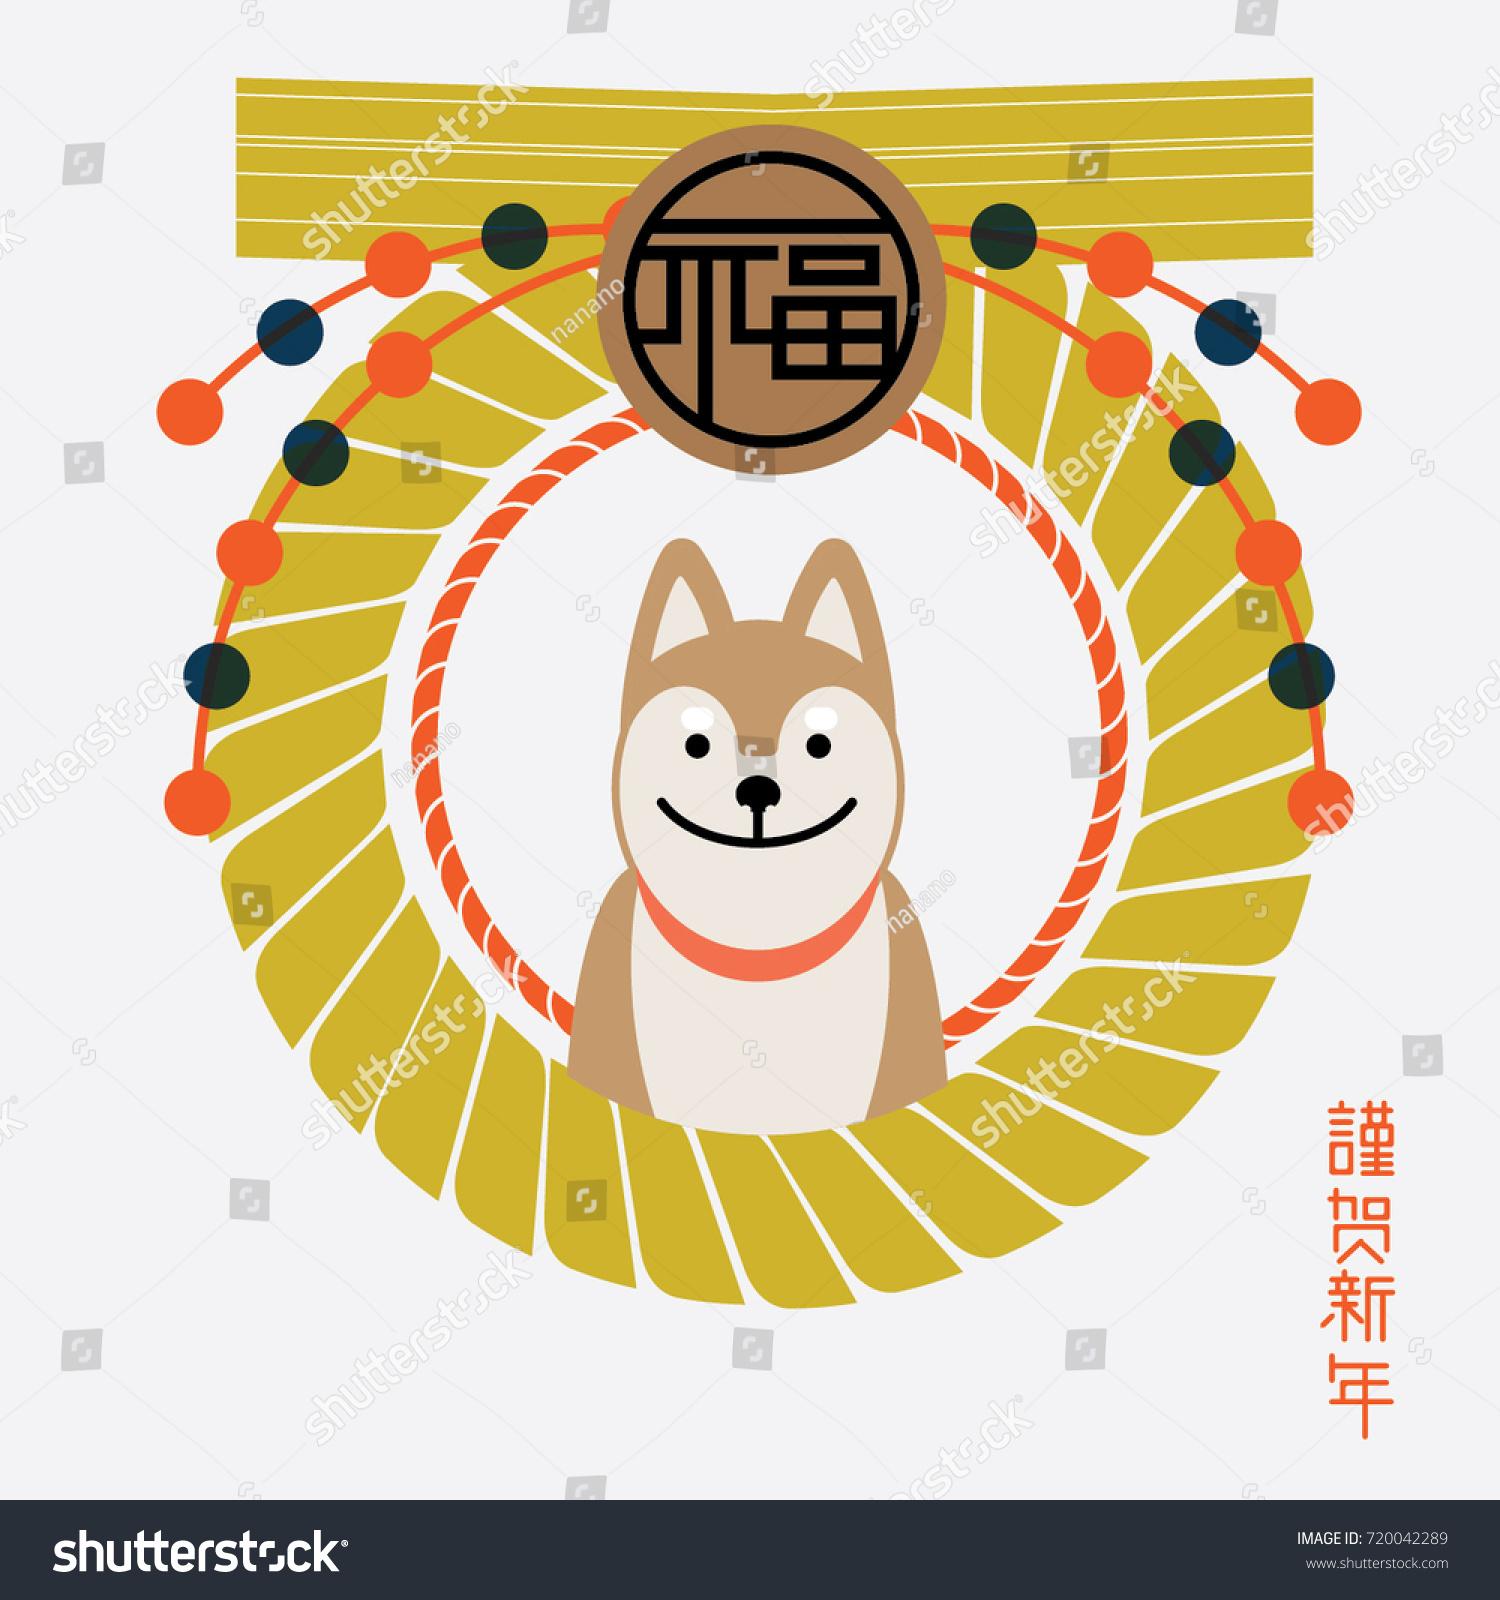 Year dog 2018 invitation card chinese stock vector 720042289 year of dog 2018 invitation card and chinese new year for 2018 translation stopboris Images